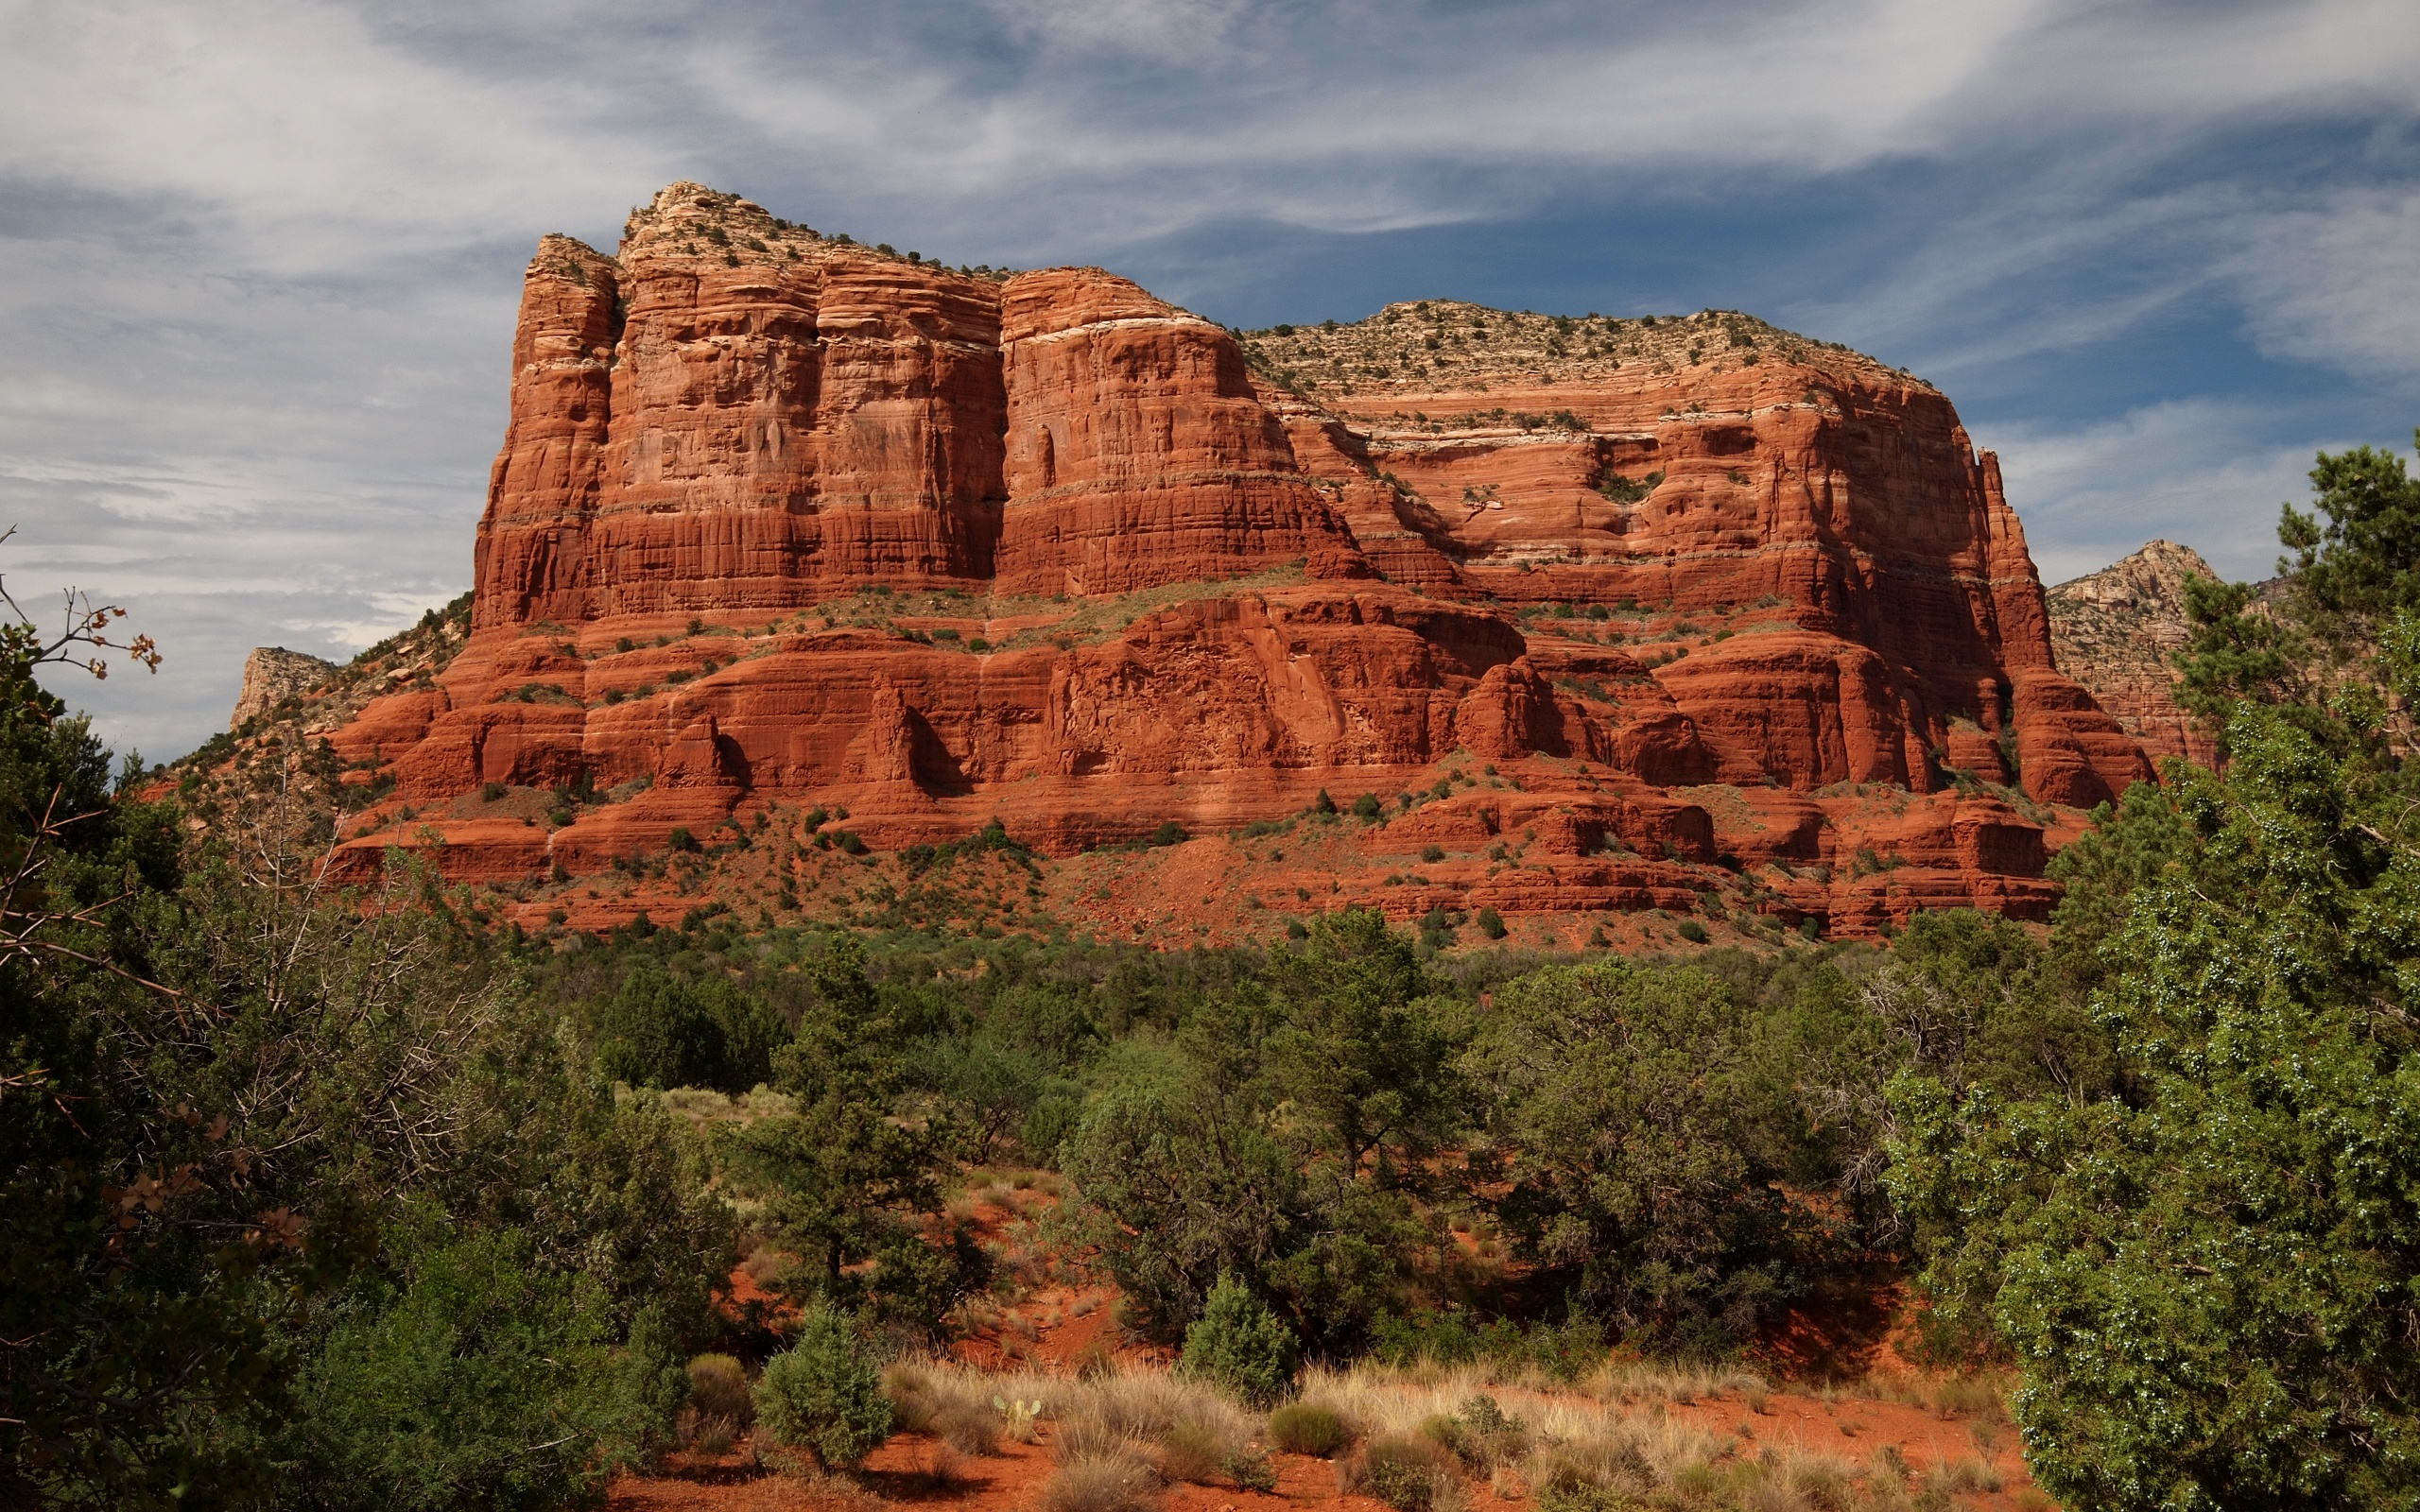 File:Sedona Arizona-27527-4.jpg